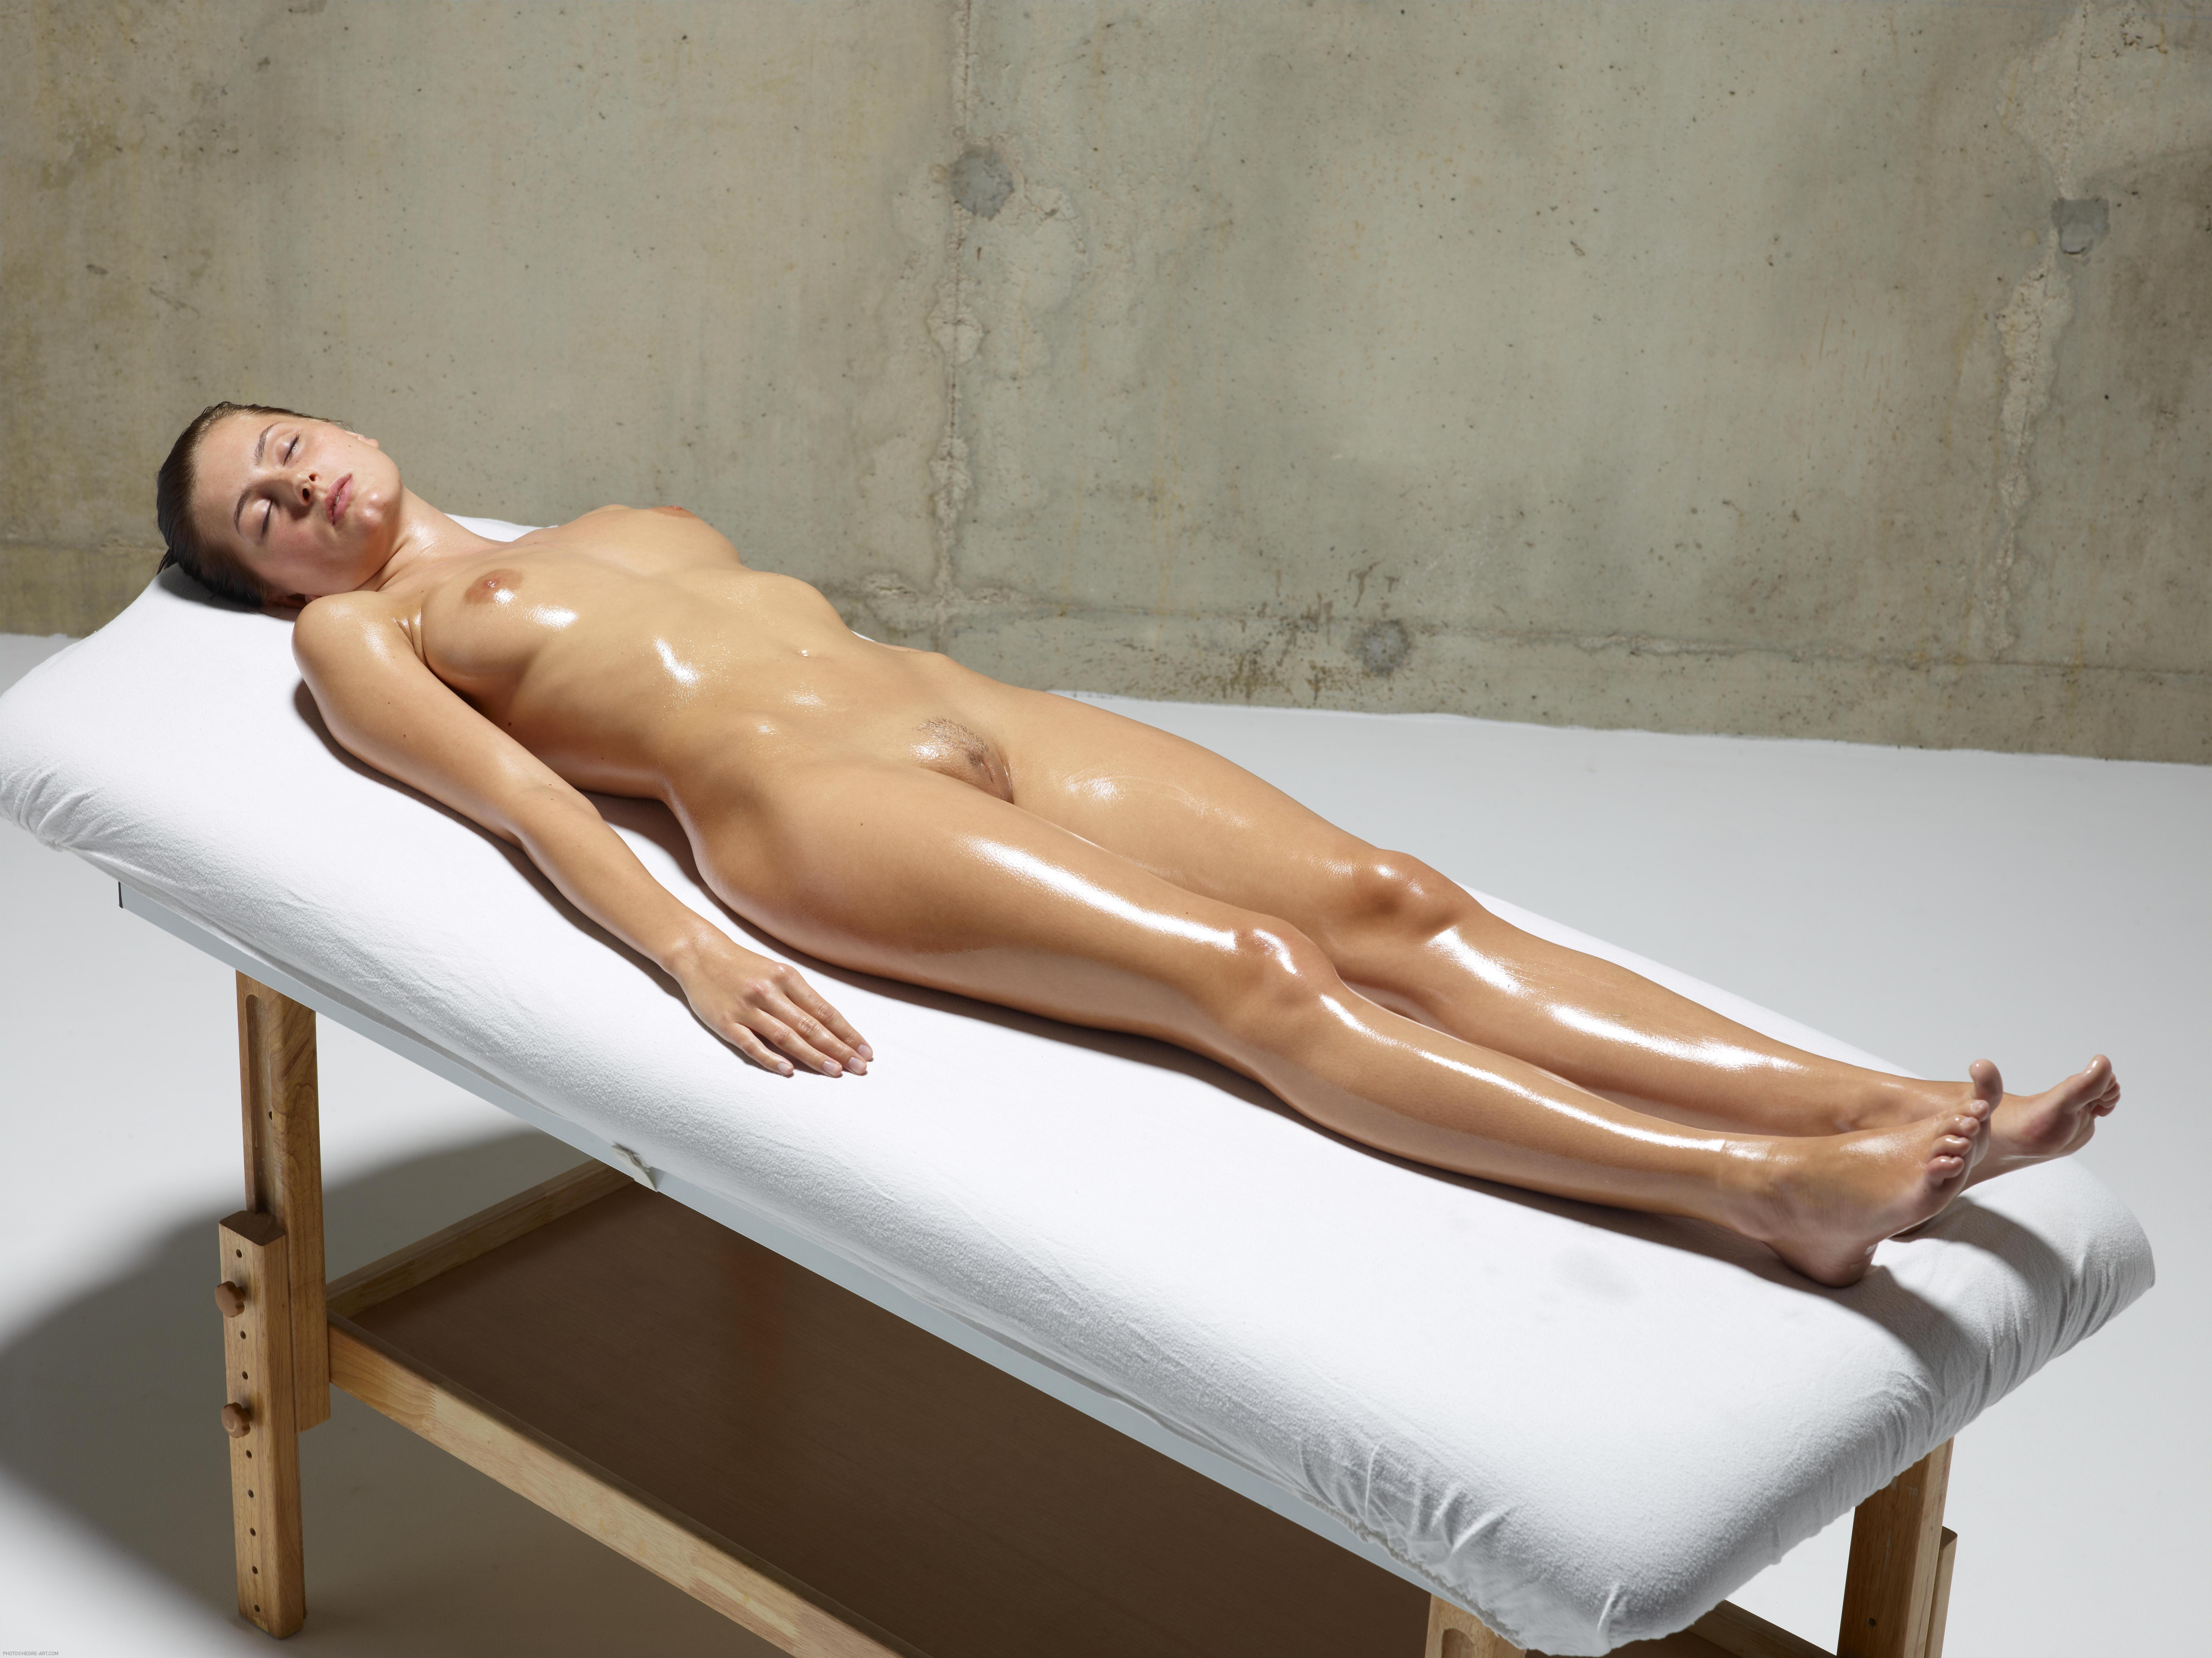 Lesbian oil massage 2 part 1 1